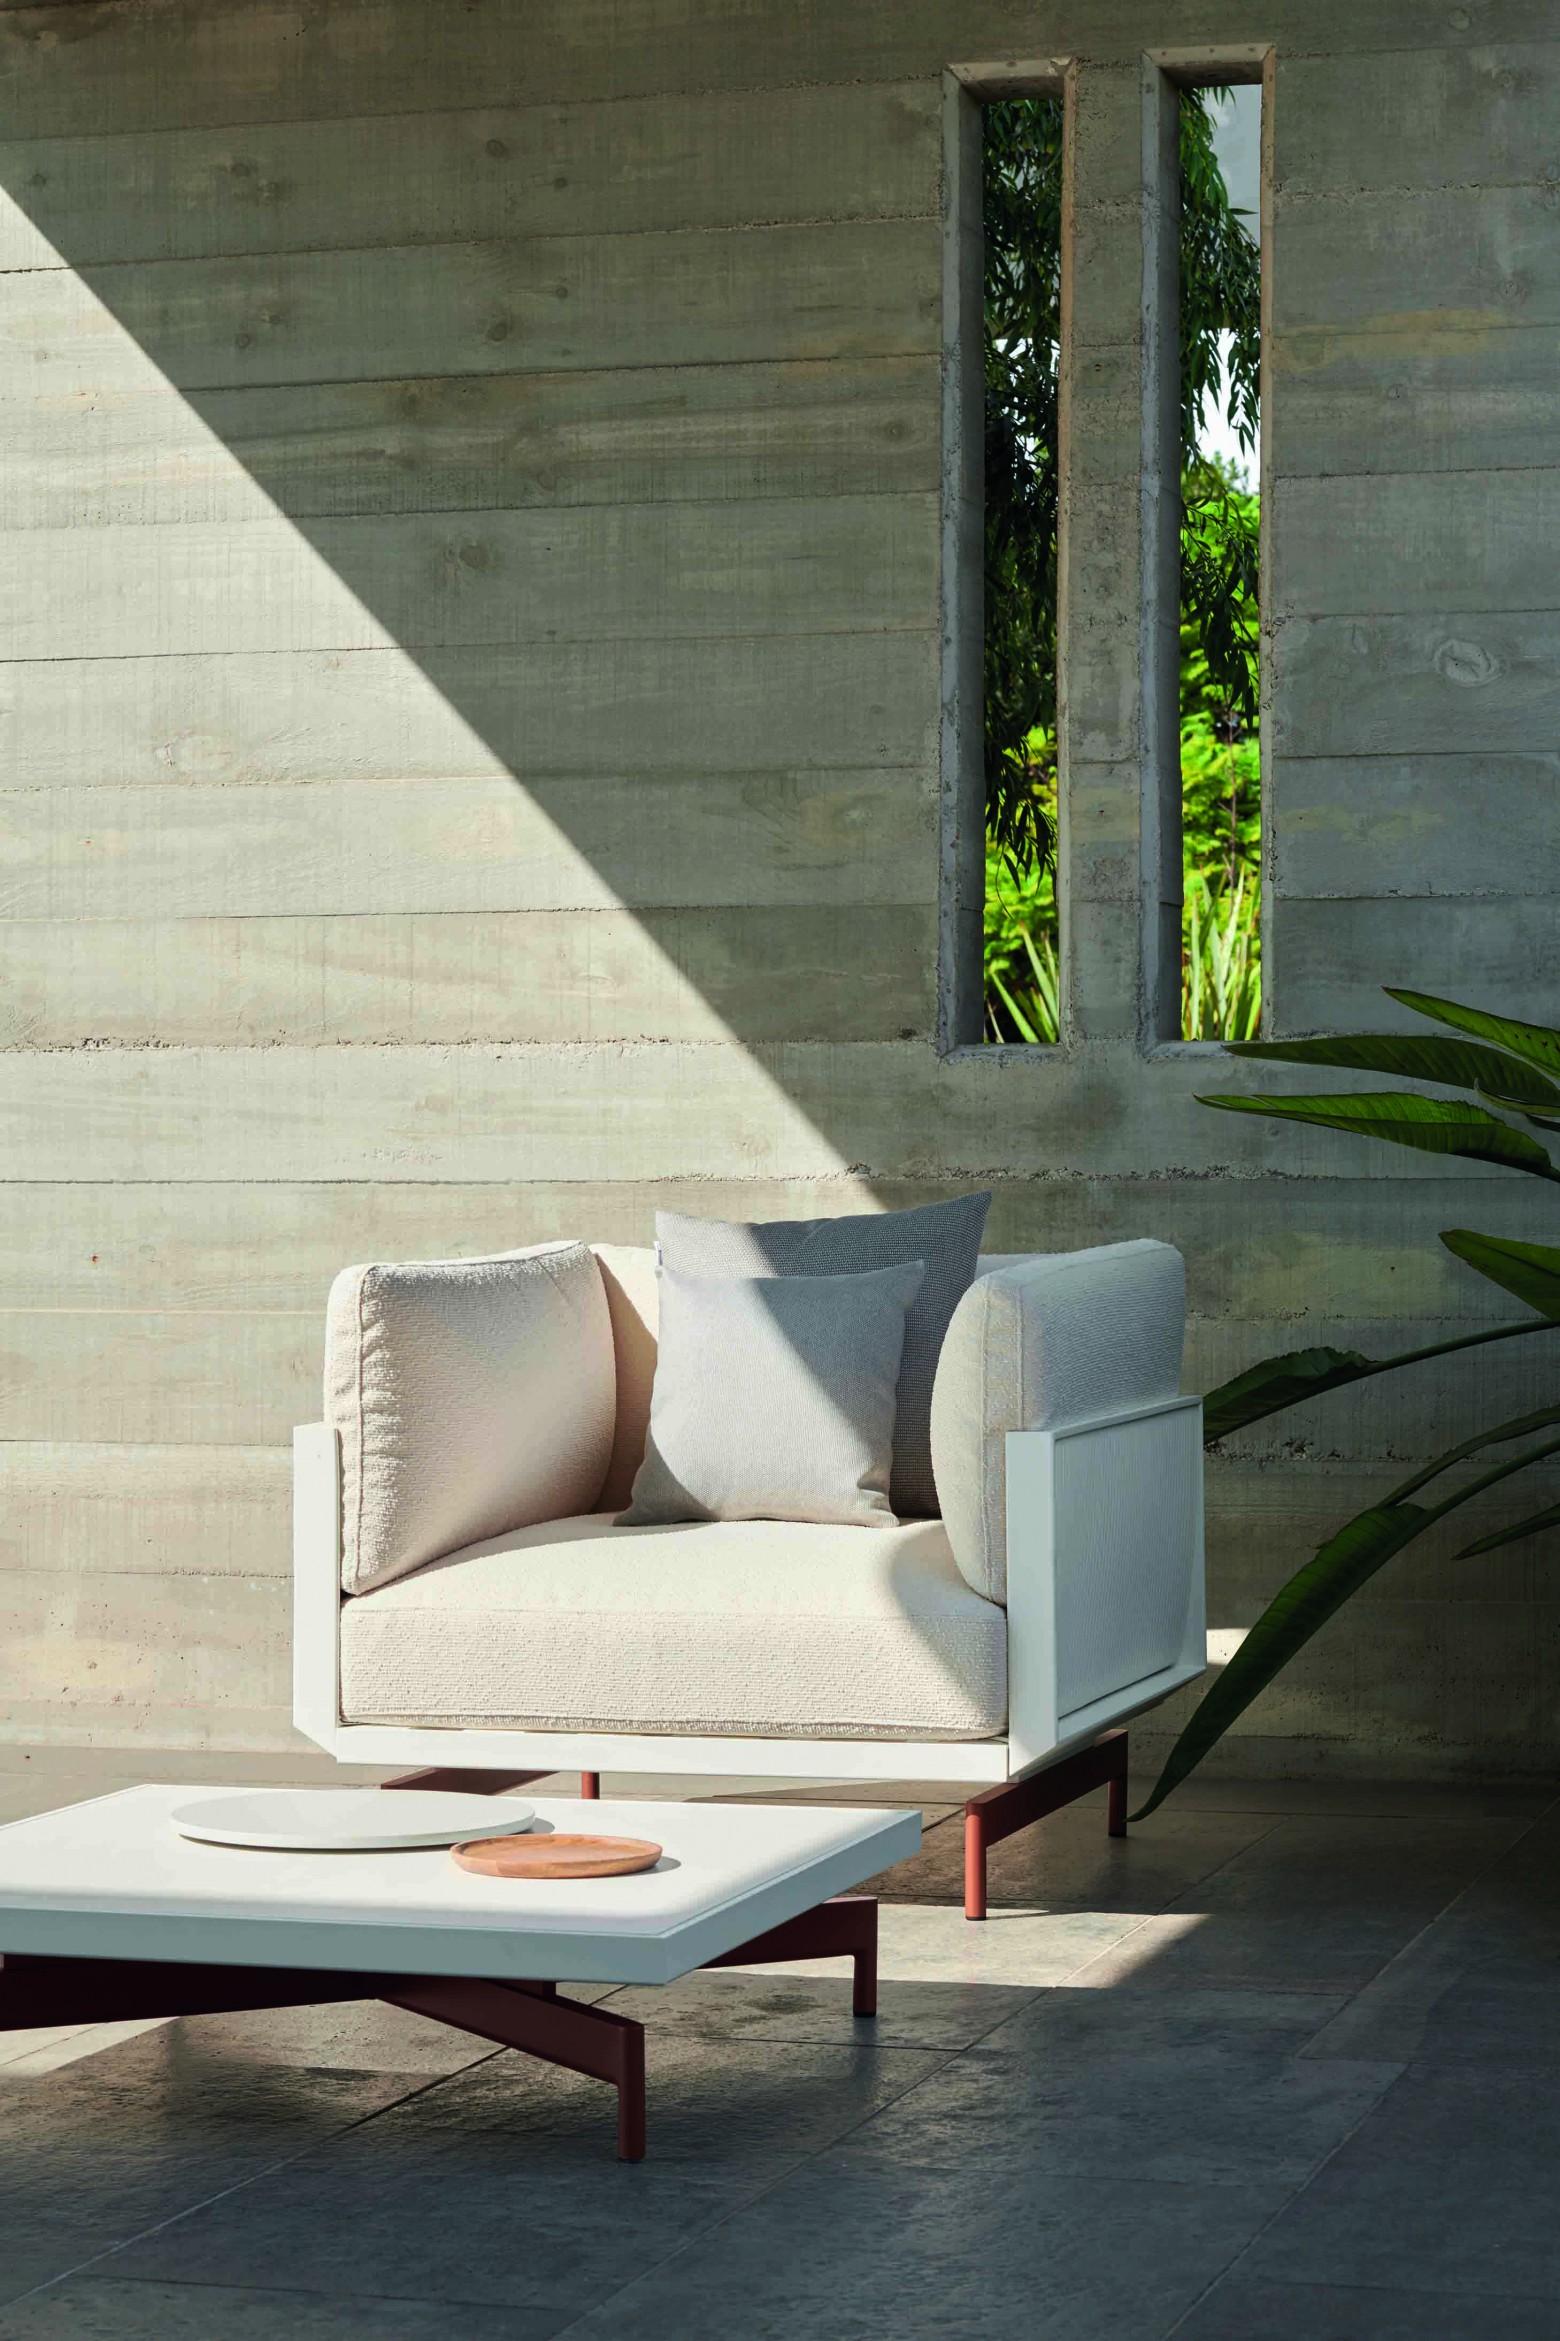 siège Onde  de couleur blanche - GandiaBlasco  Victors Design Agency